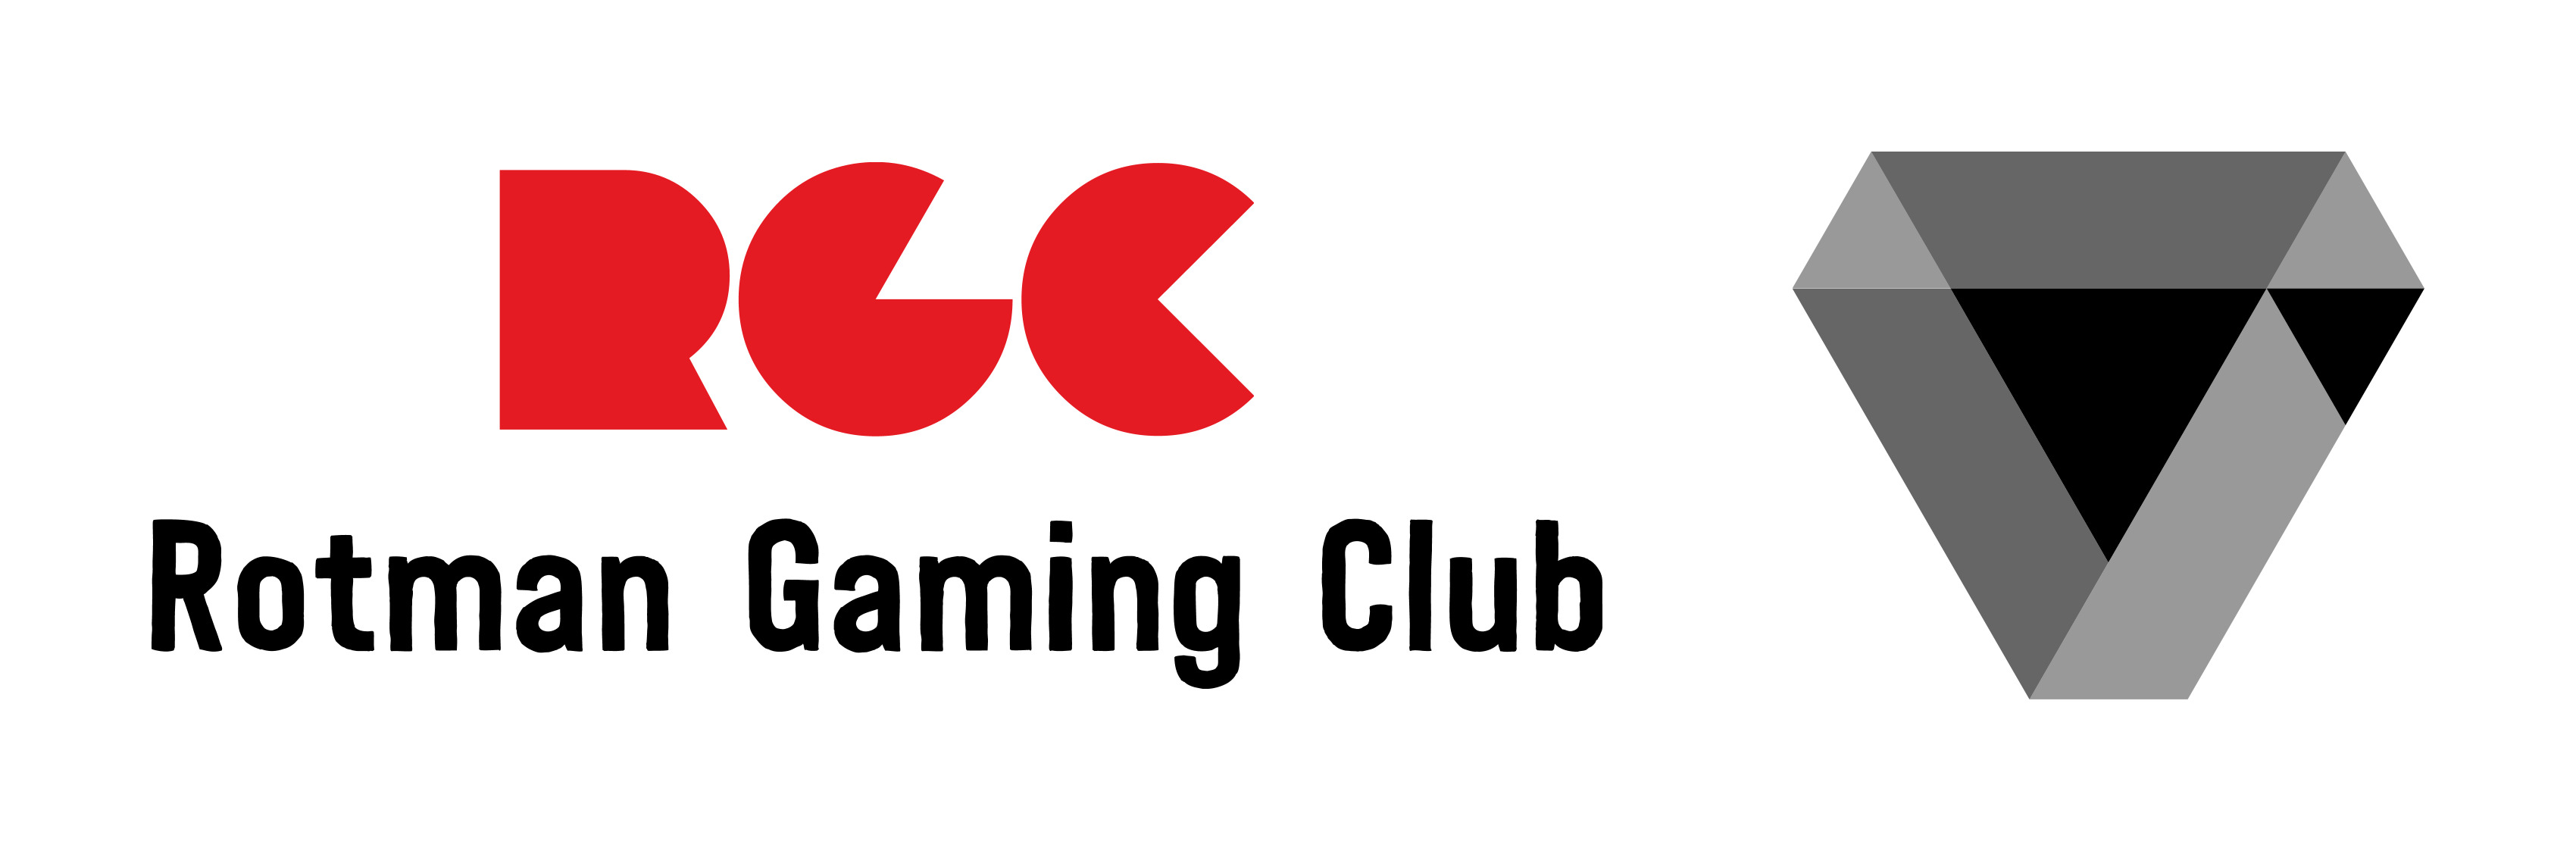 Rotman Gaming Club